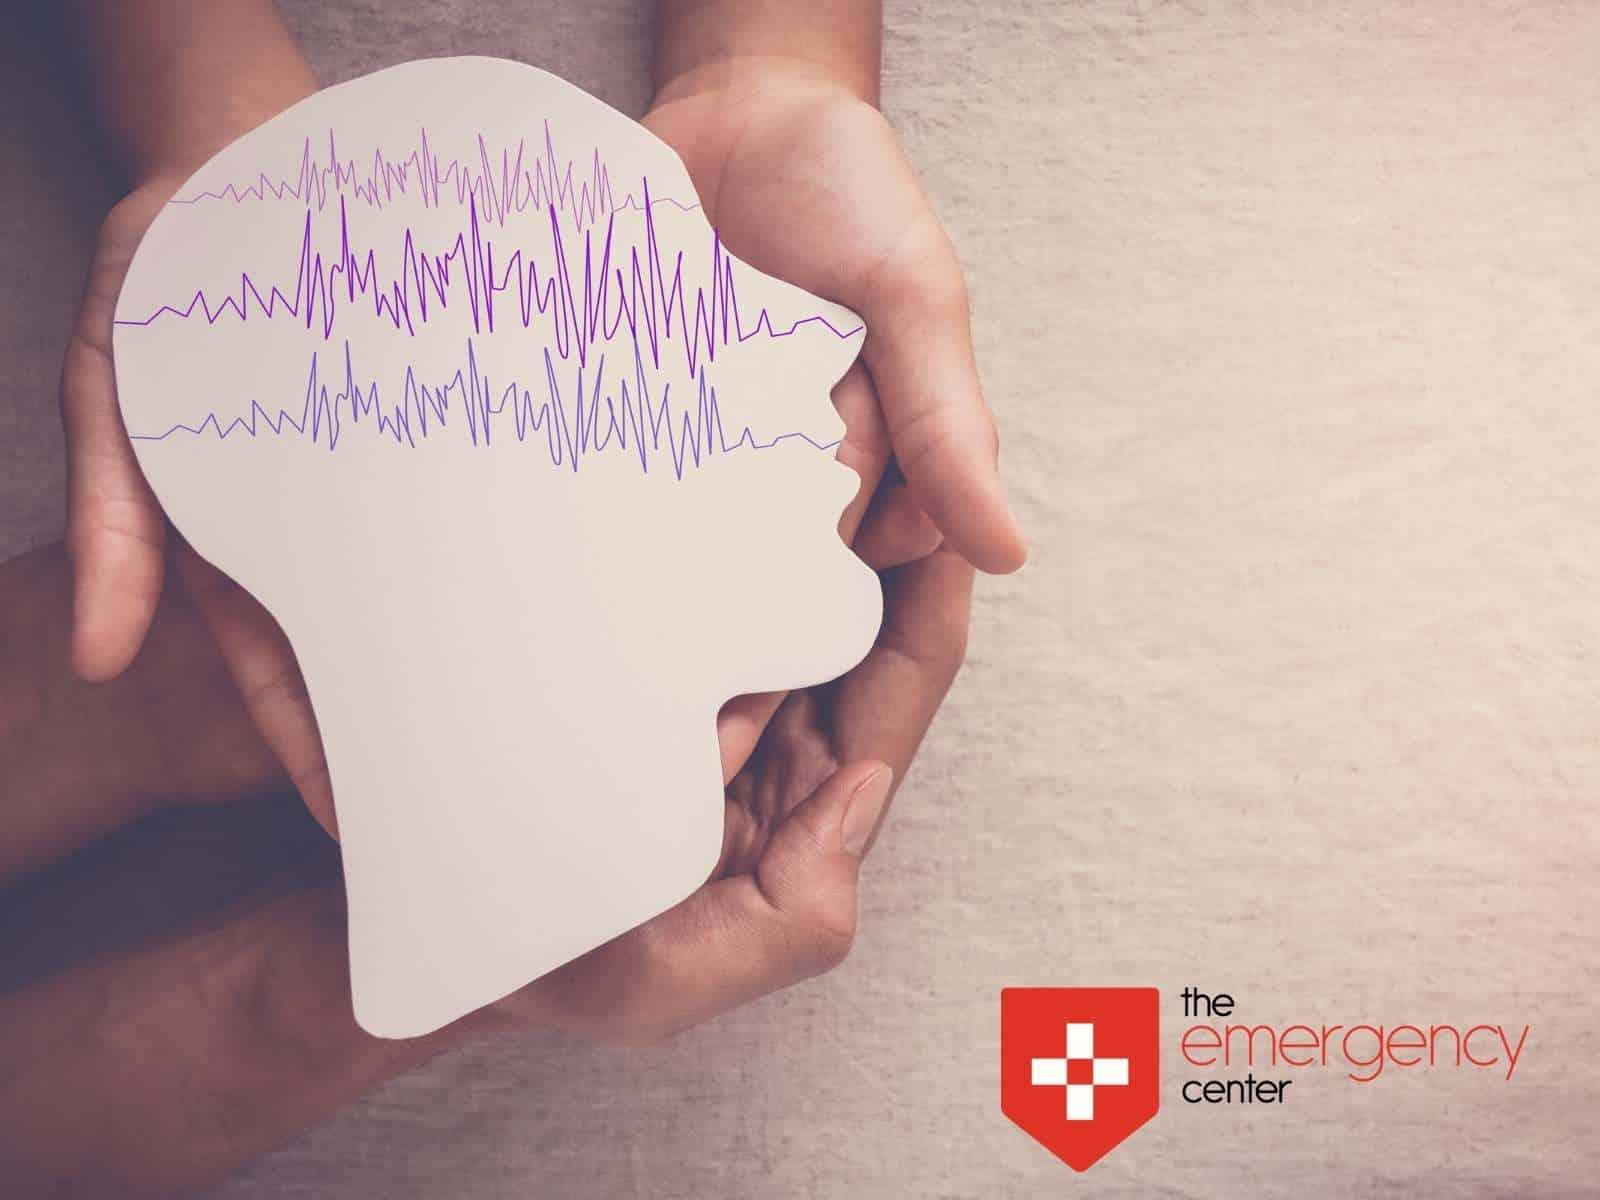 Seizures & Epilepsy: Symptoms, Causes & Differences blog